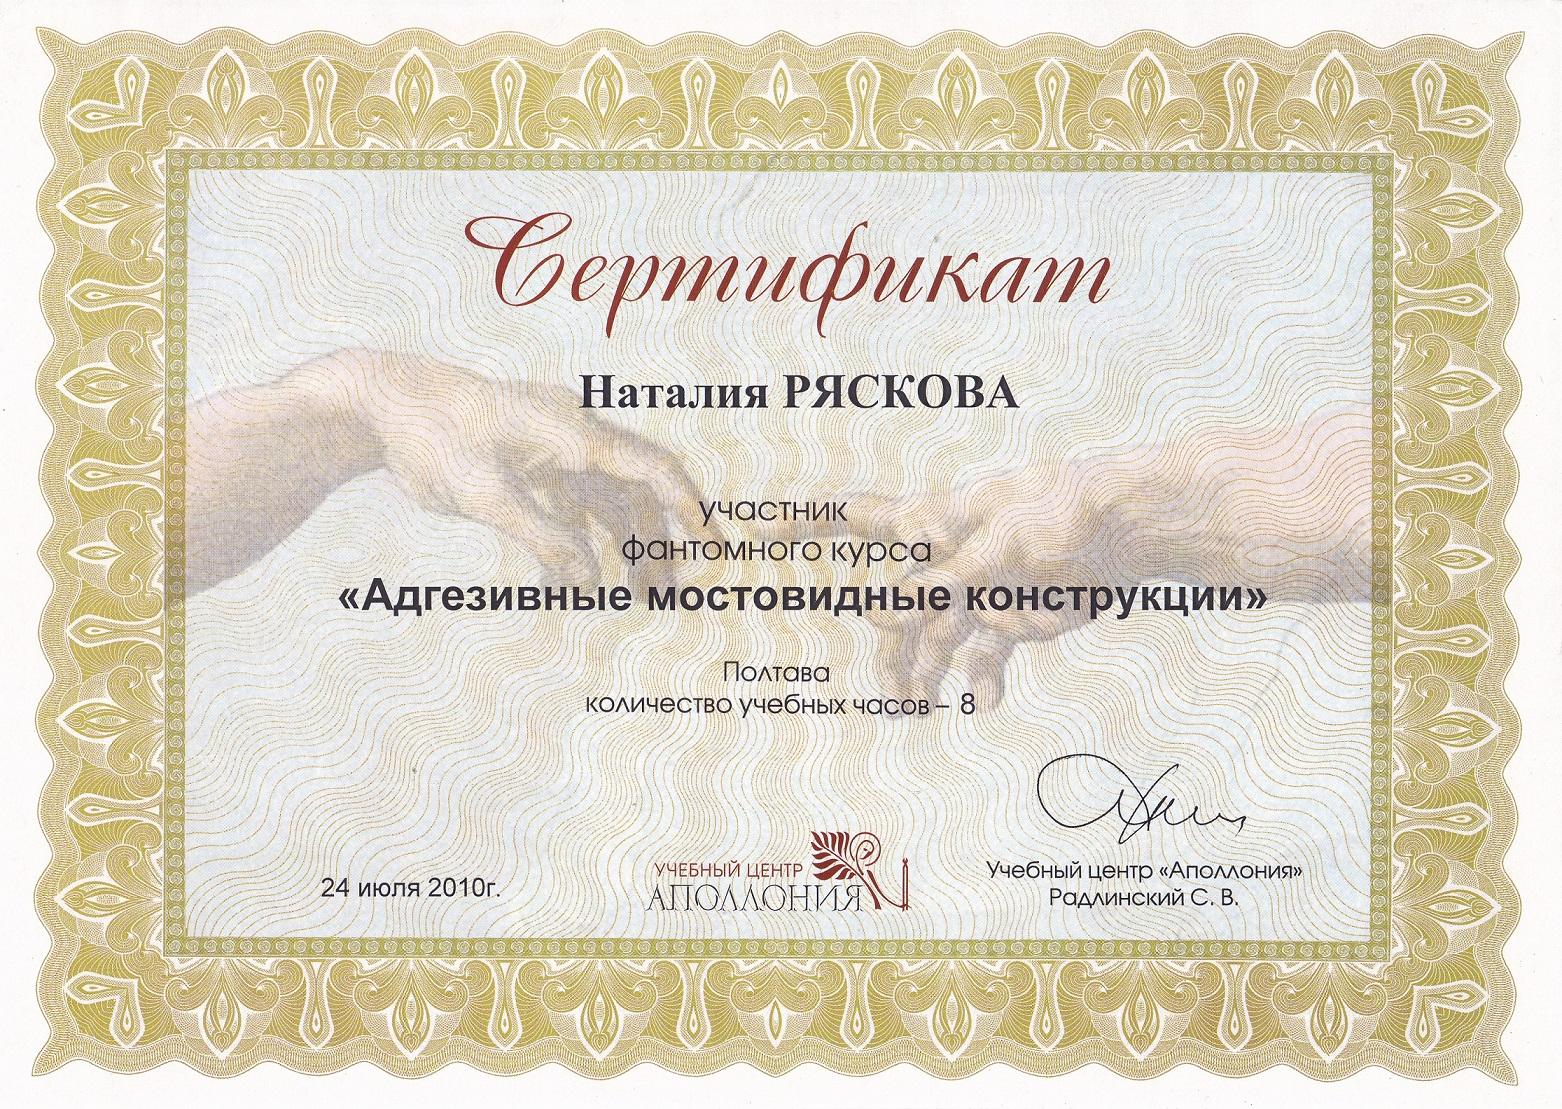 http://oris-vidnoe.ru/wp-content/uploads/2021/05/ryaskova1.jpg